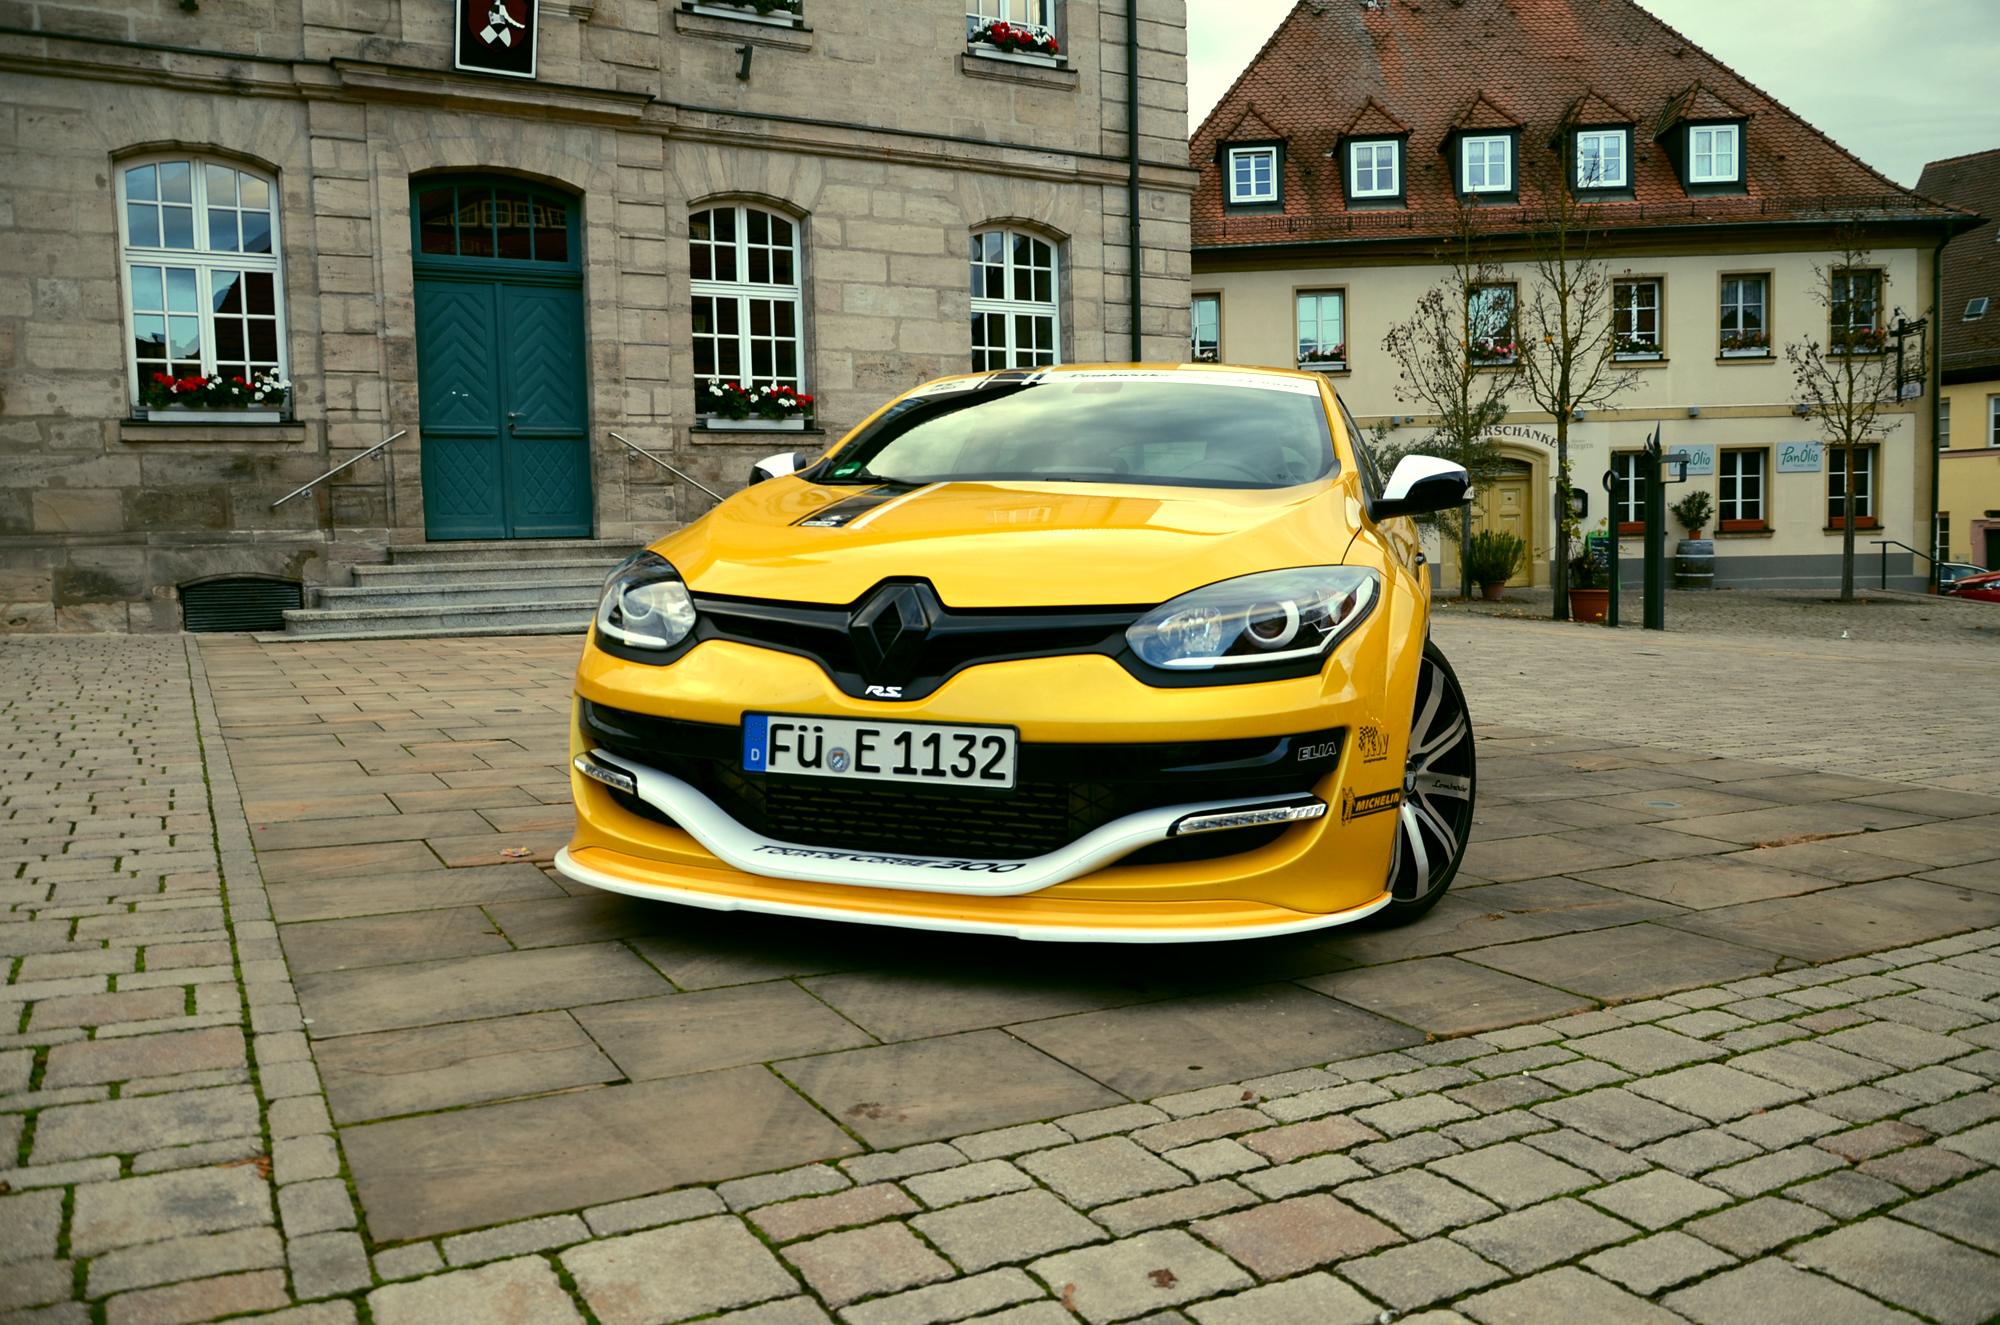 Auf Fahrspaß getrimmt: Der Renault Mégane R.S. Tour de Corse 300 trägt seinen Namen zurecht